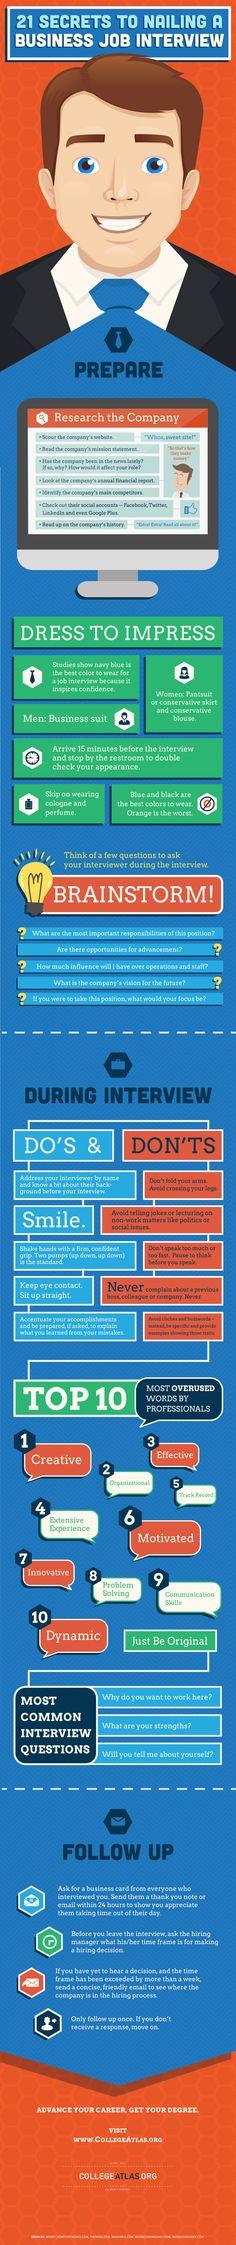 The Top 21 Secrets to Nailing a Business Job Interview #Infographics #career #social — Lightscap3s.com